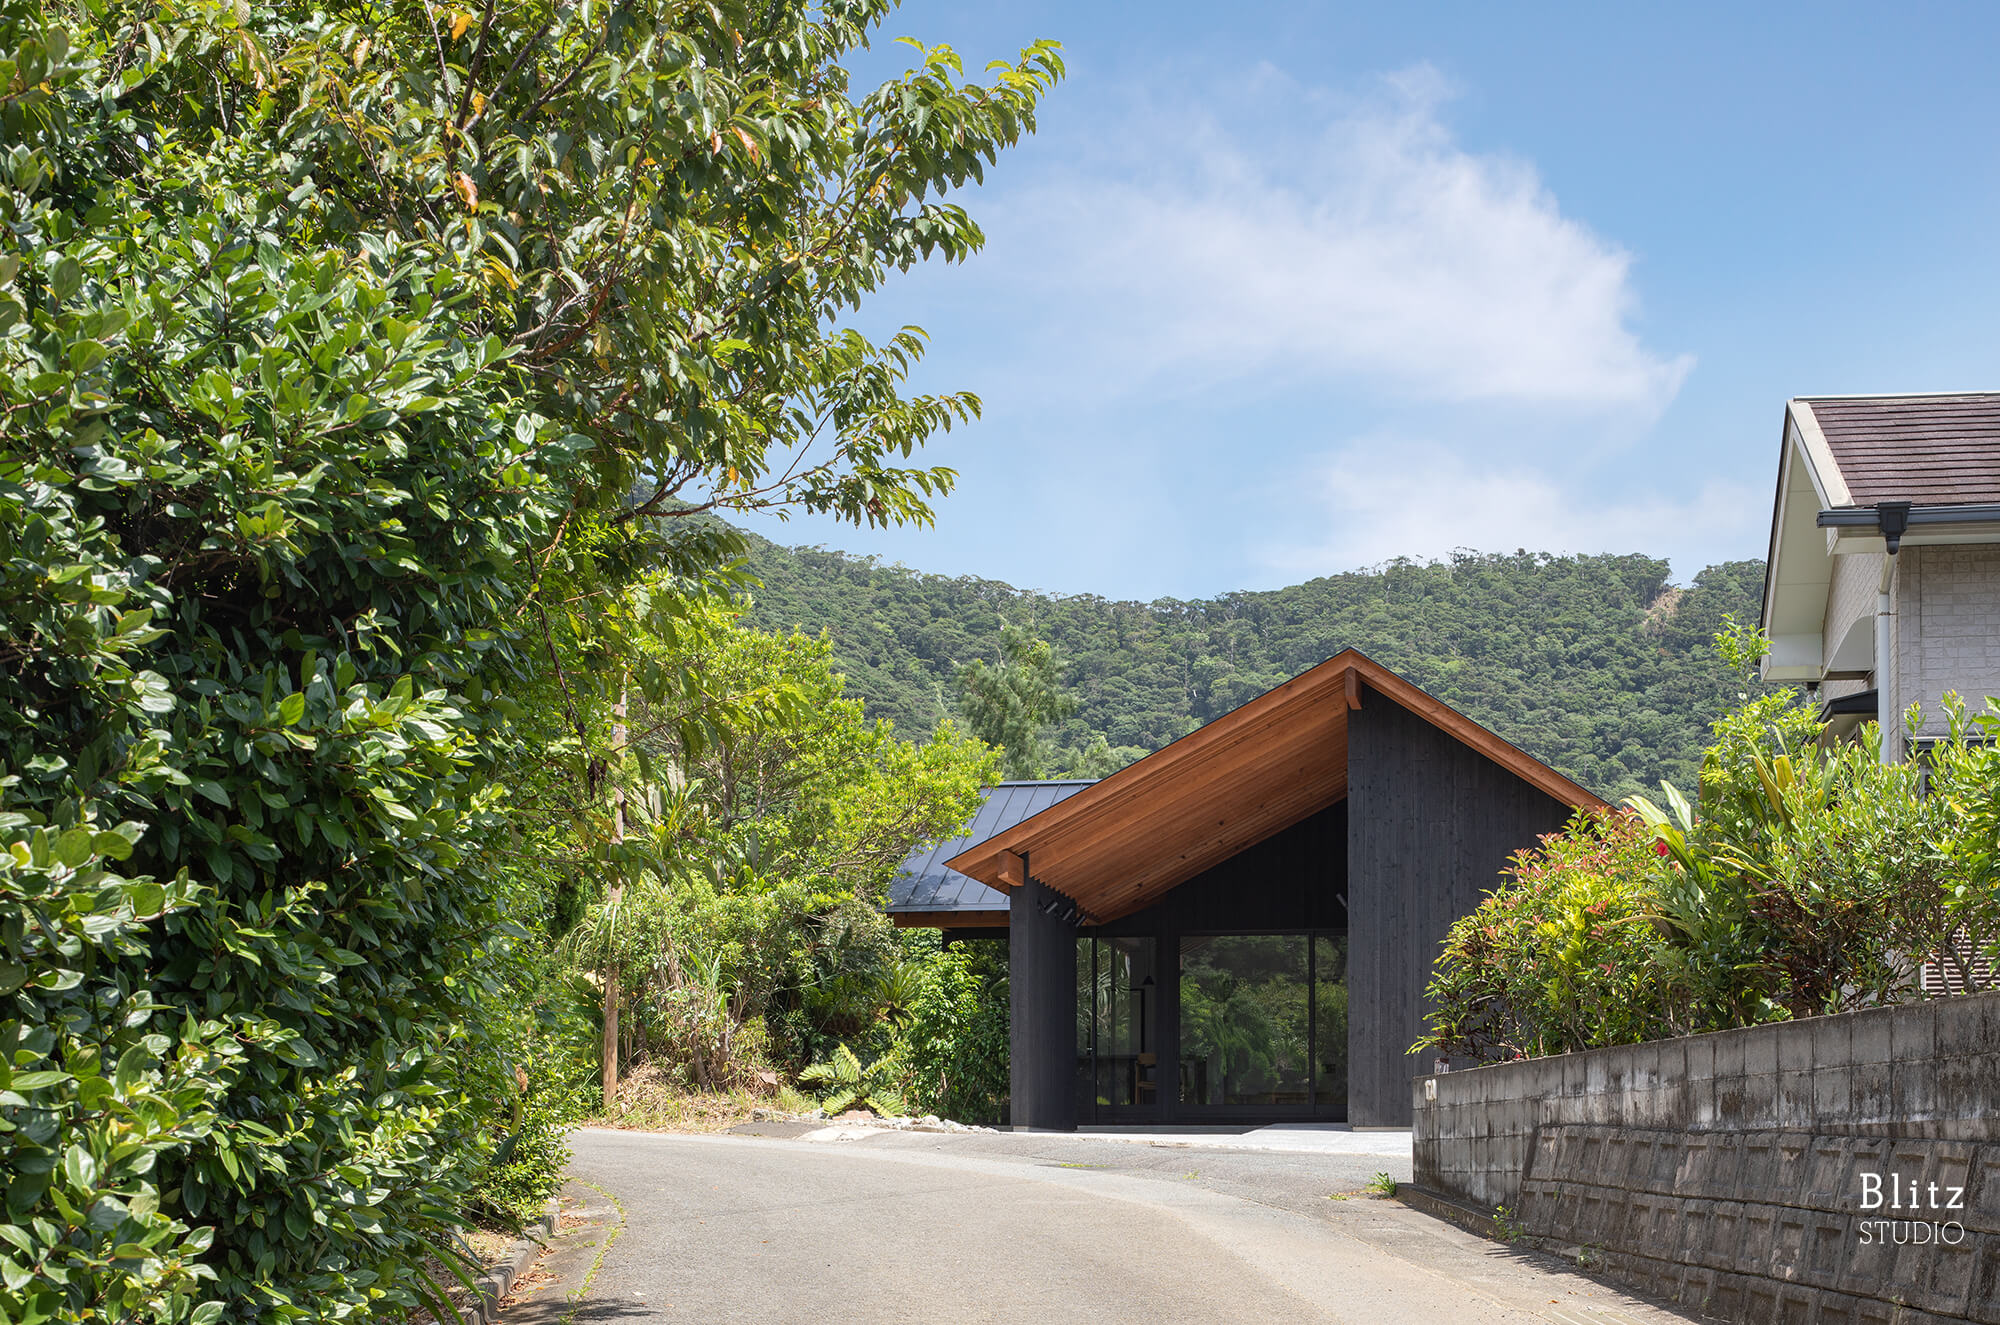 『浦の家』-鹿児島県奄美大島-建築写真・竣工写真・インテリア写真1